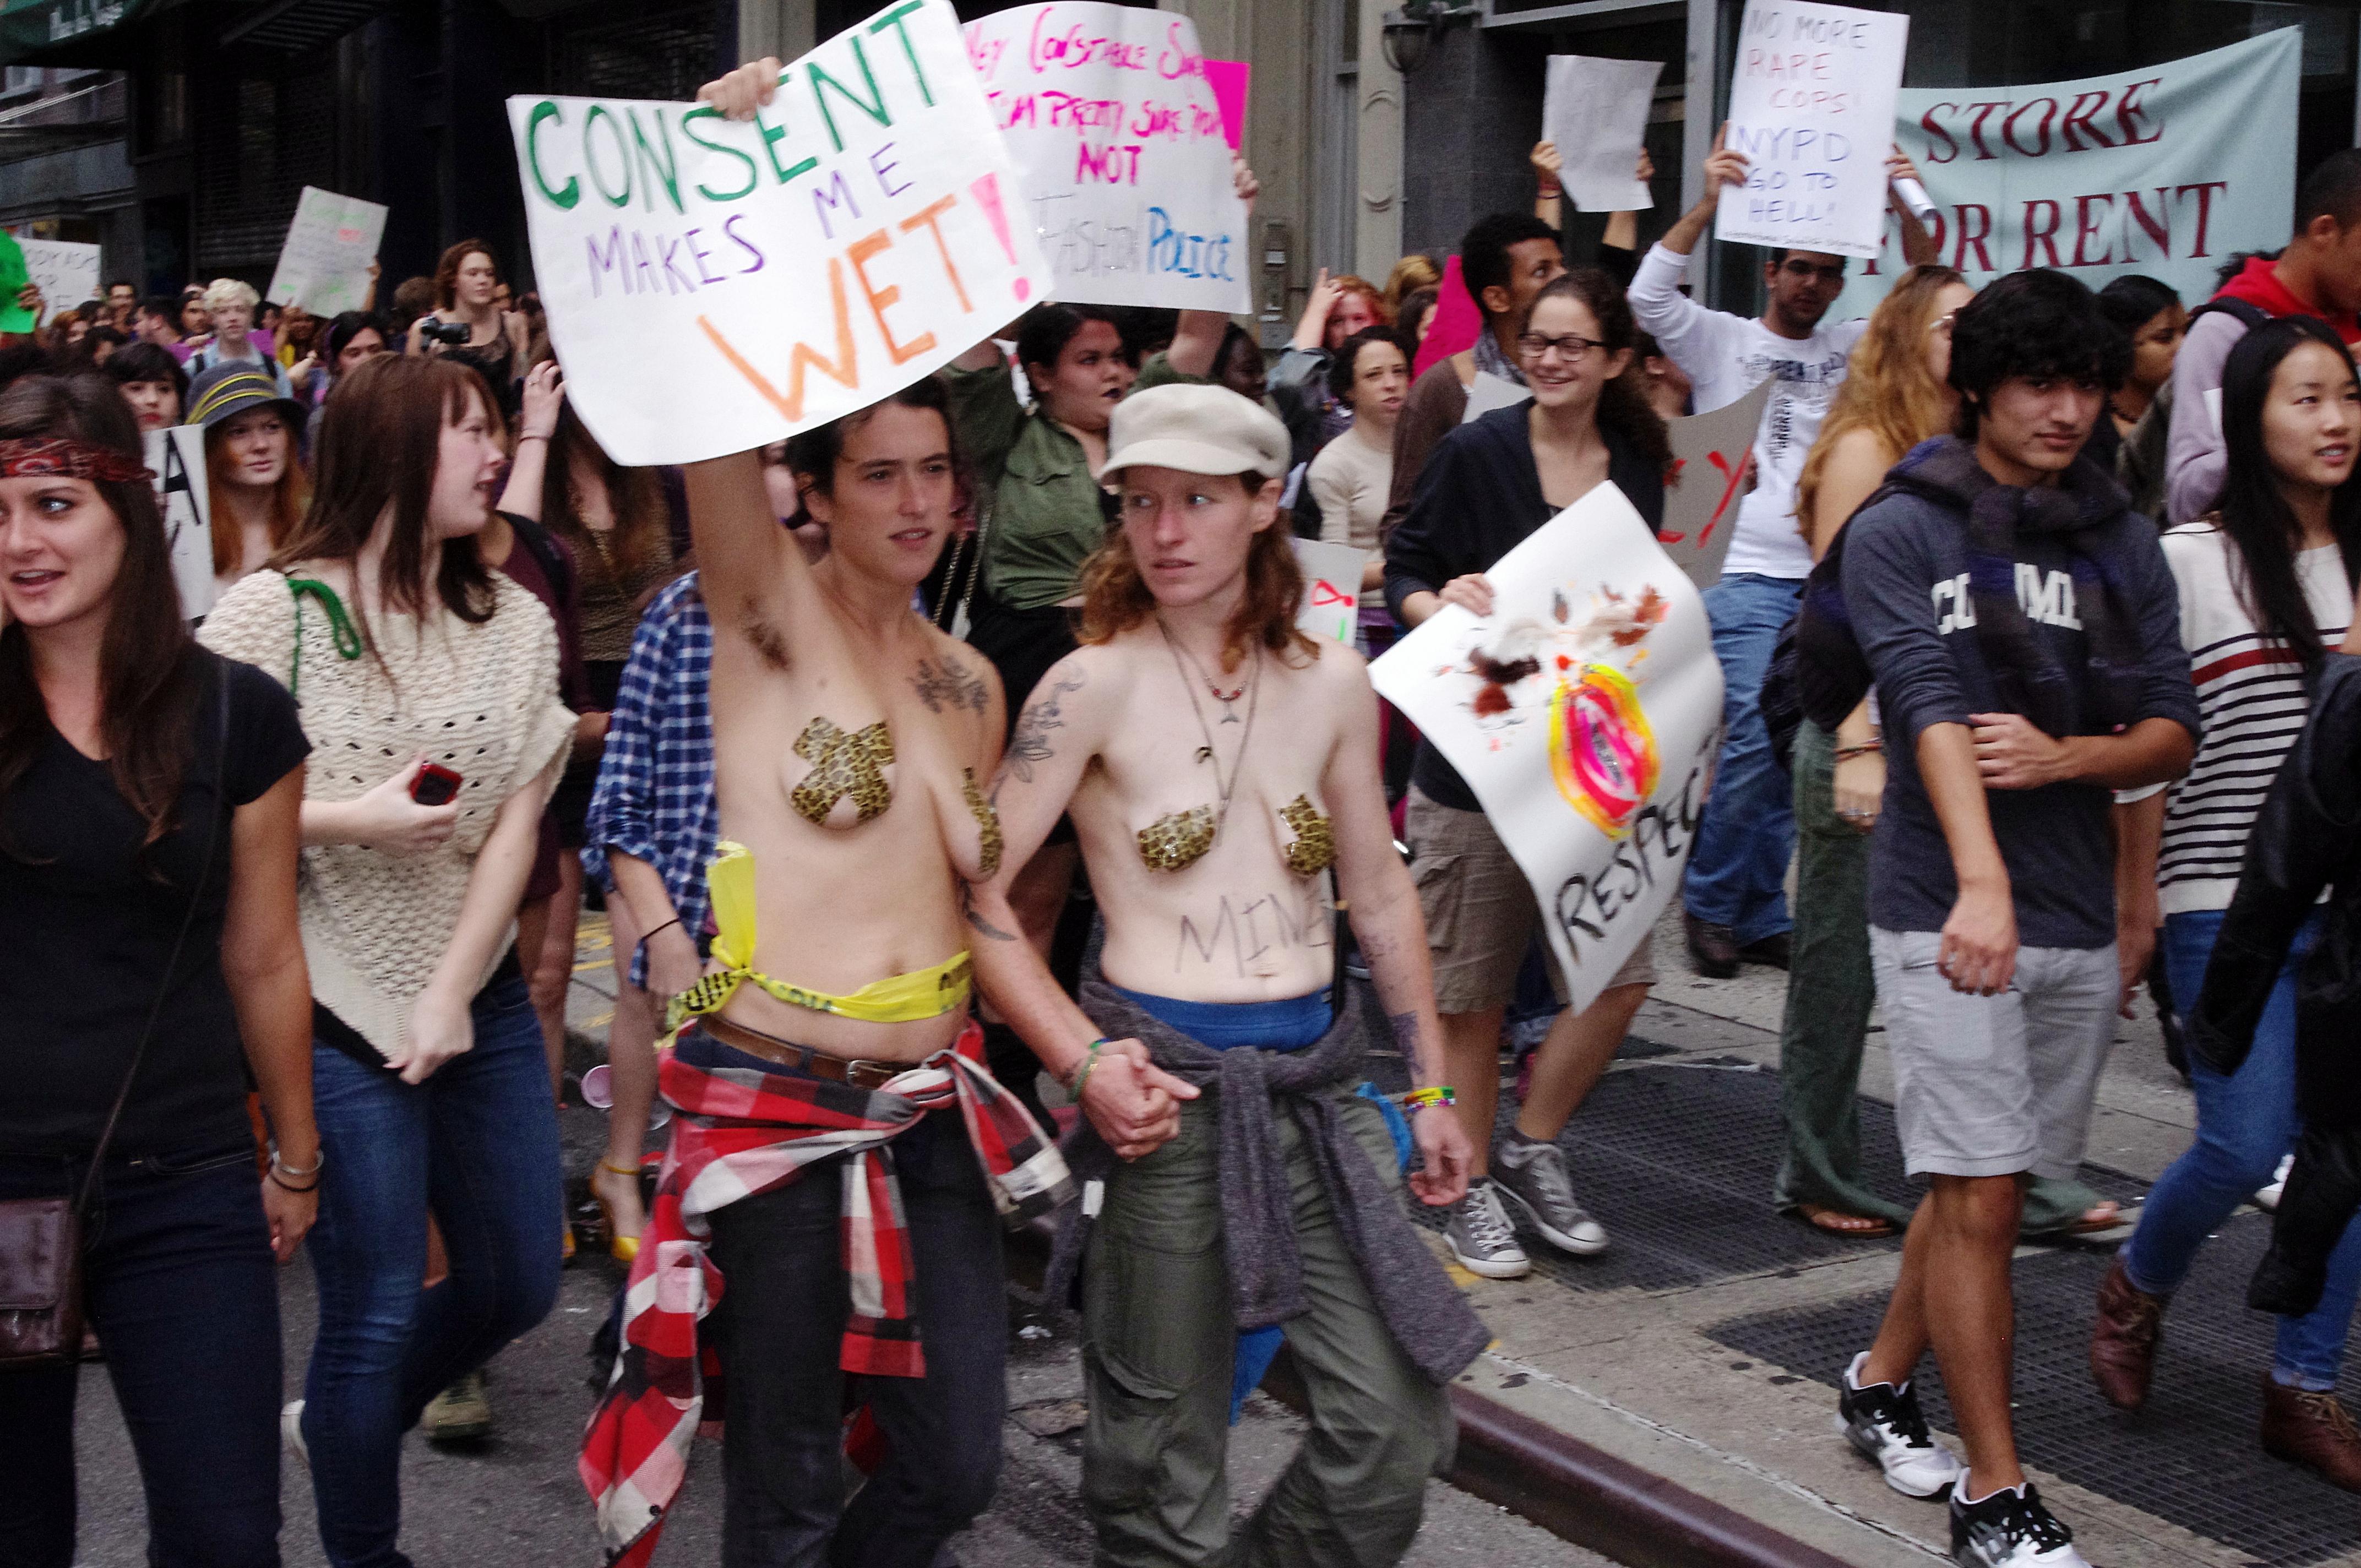 Useful idea Toronto slut walk photos